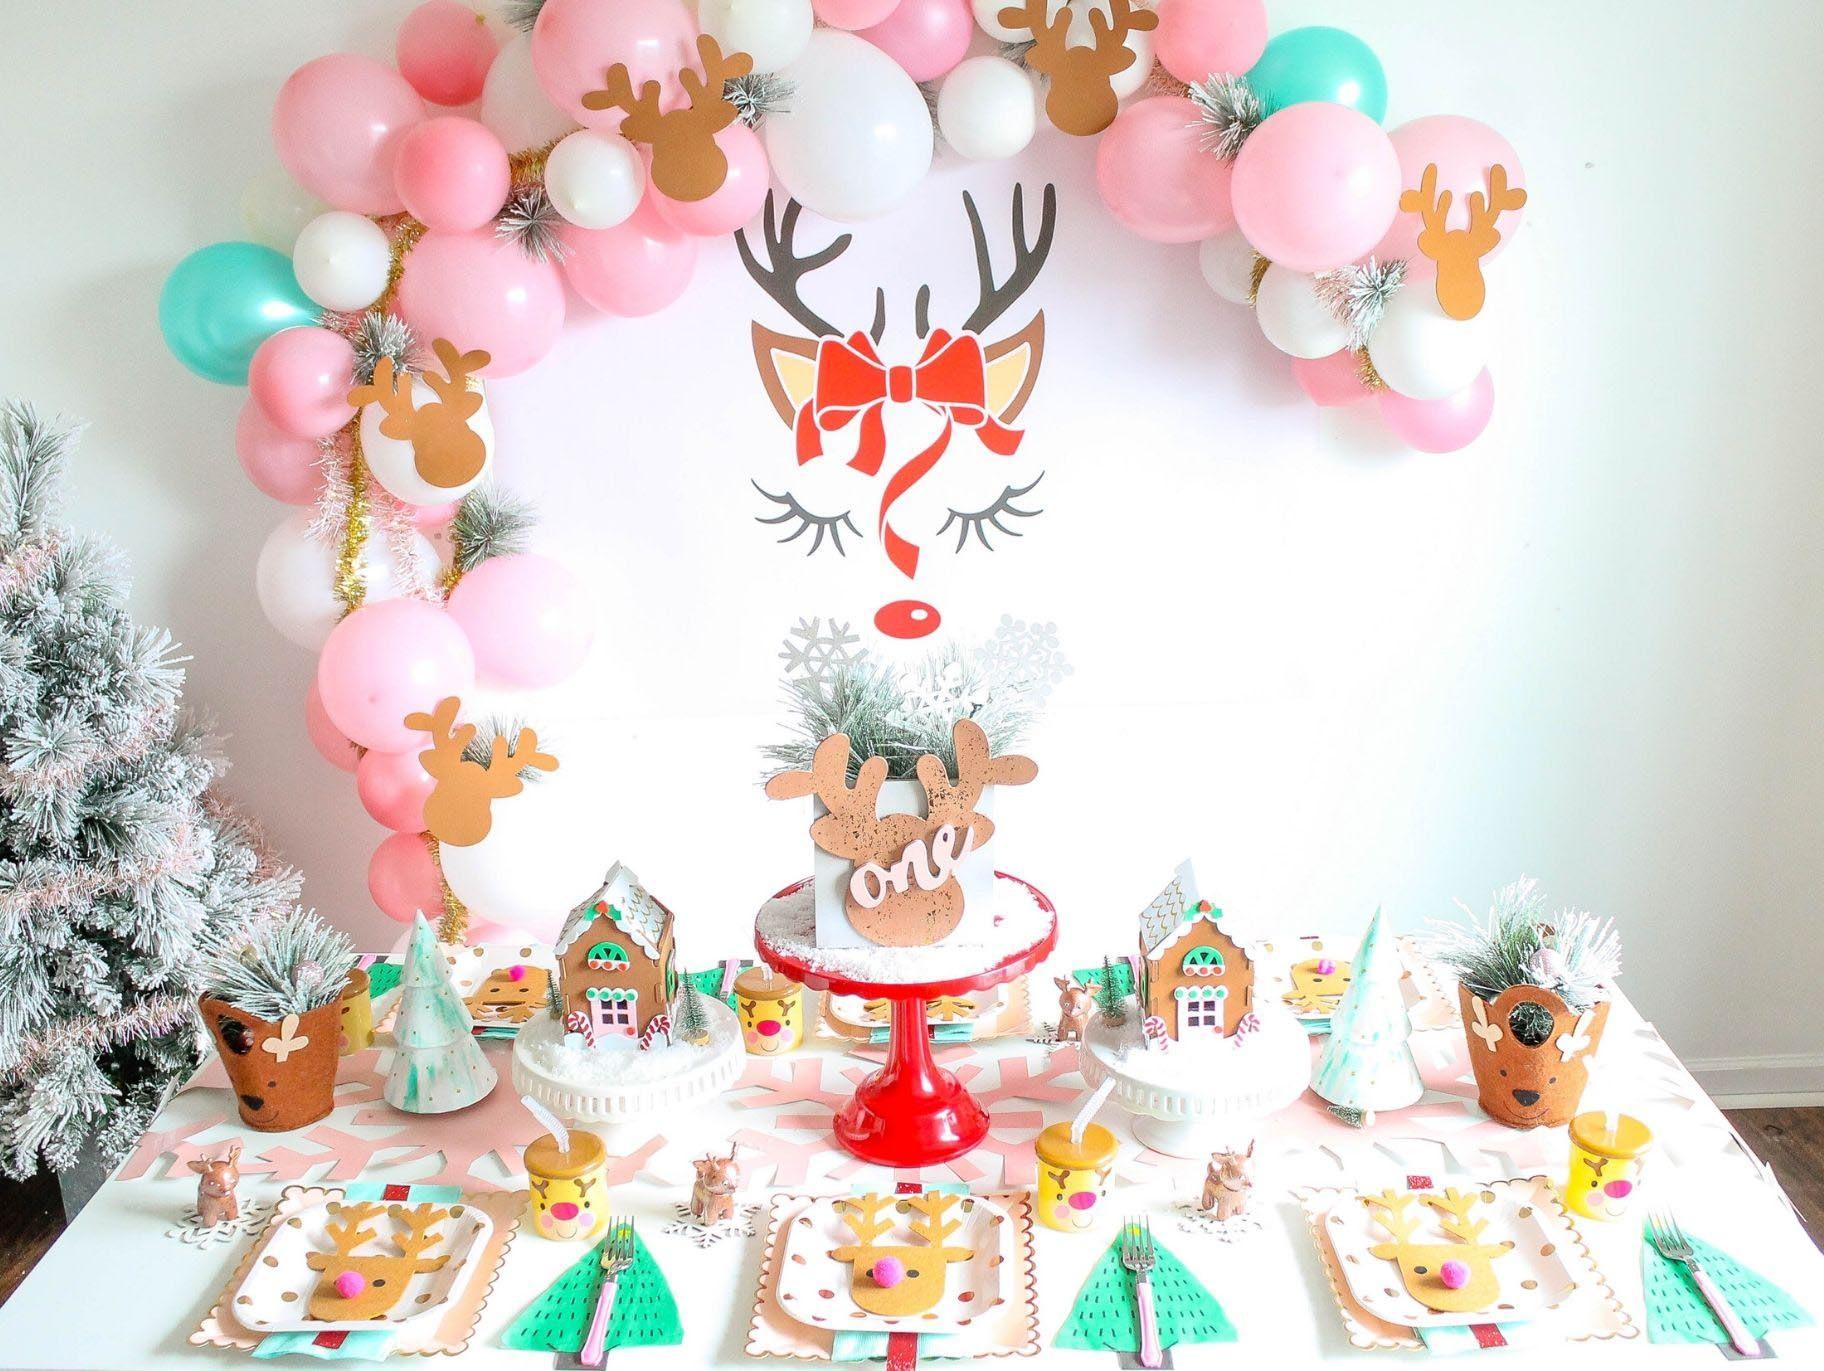 Diy Reindeer Balloon Garland Backdrop Fun365